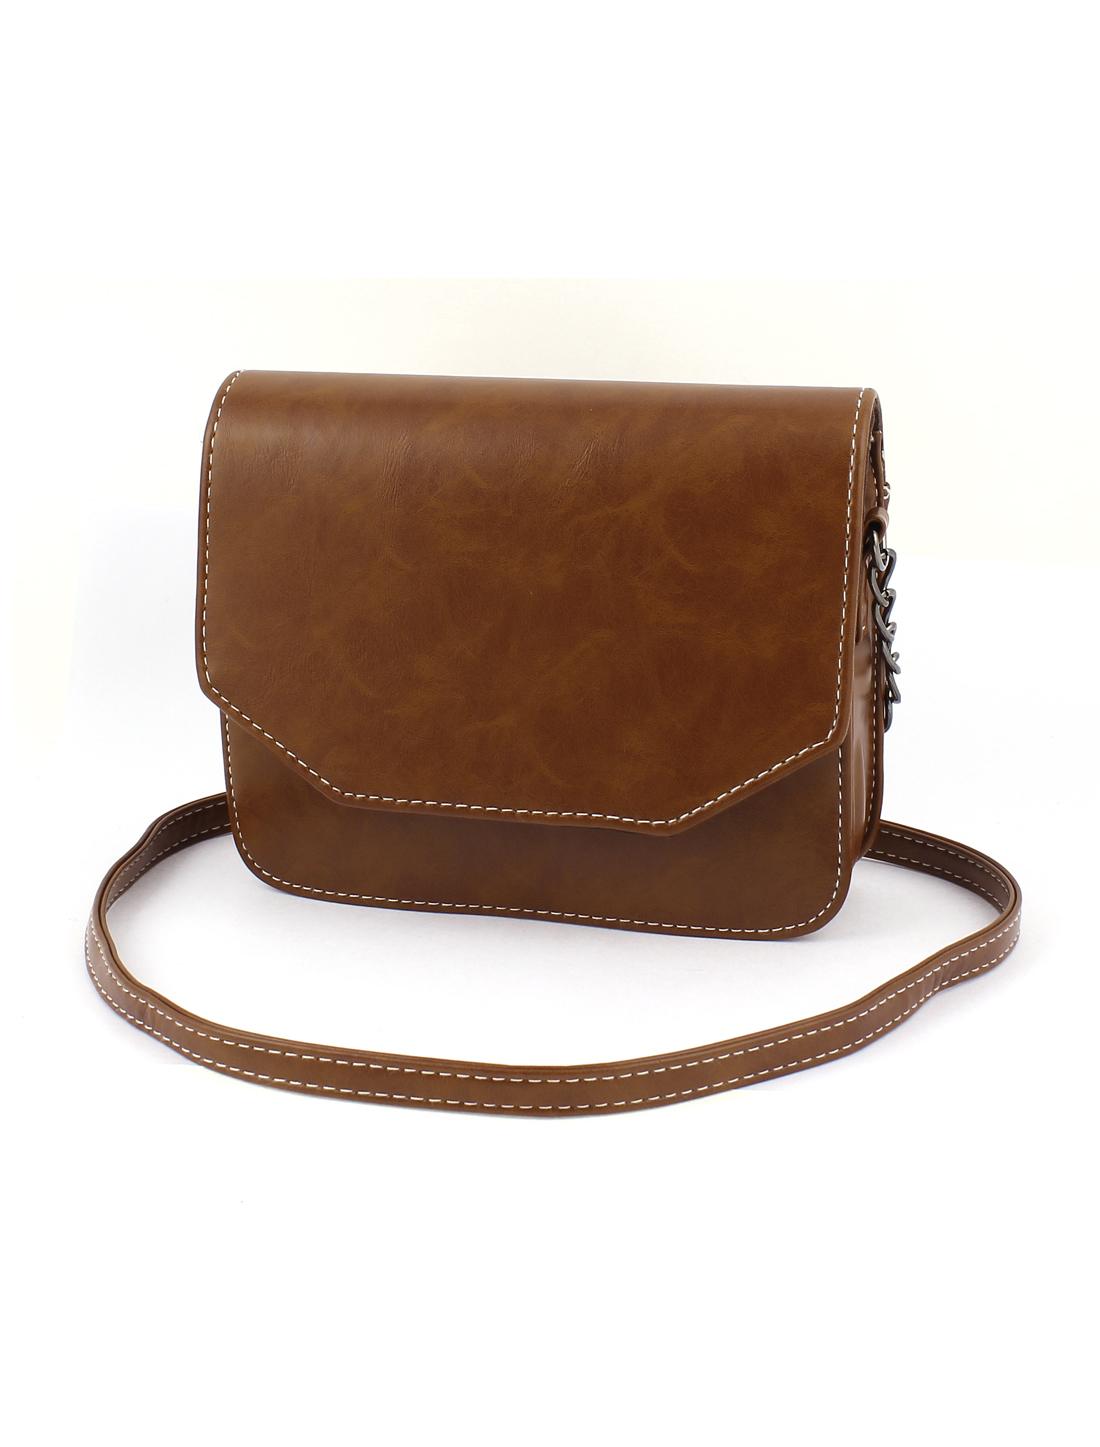 Women Vintage Style PU Leather Mini Shoulderbag Messenger Bag Satchel Brown